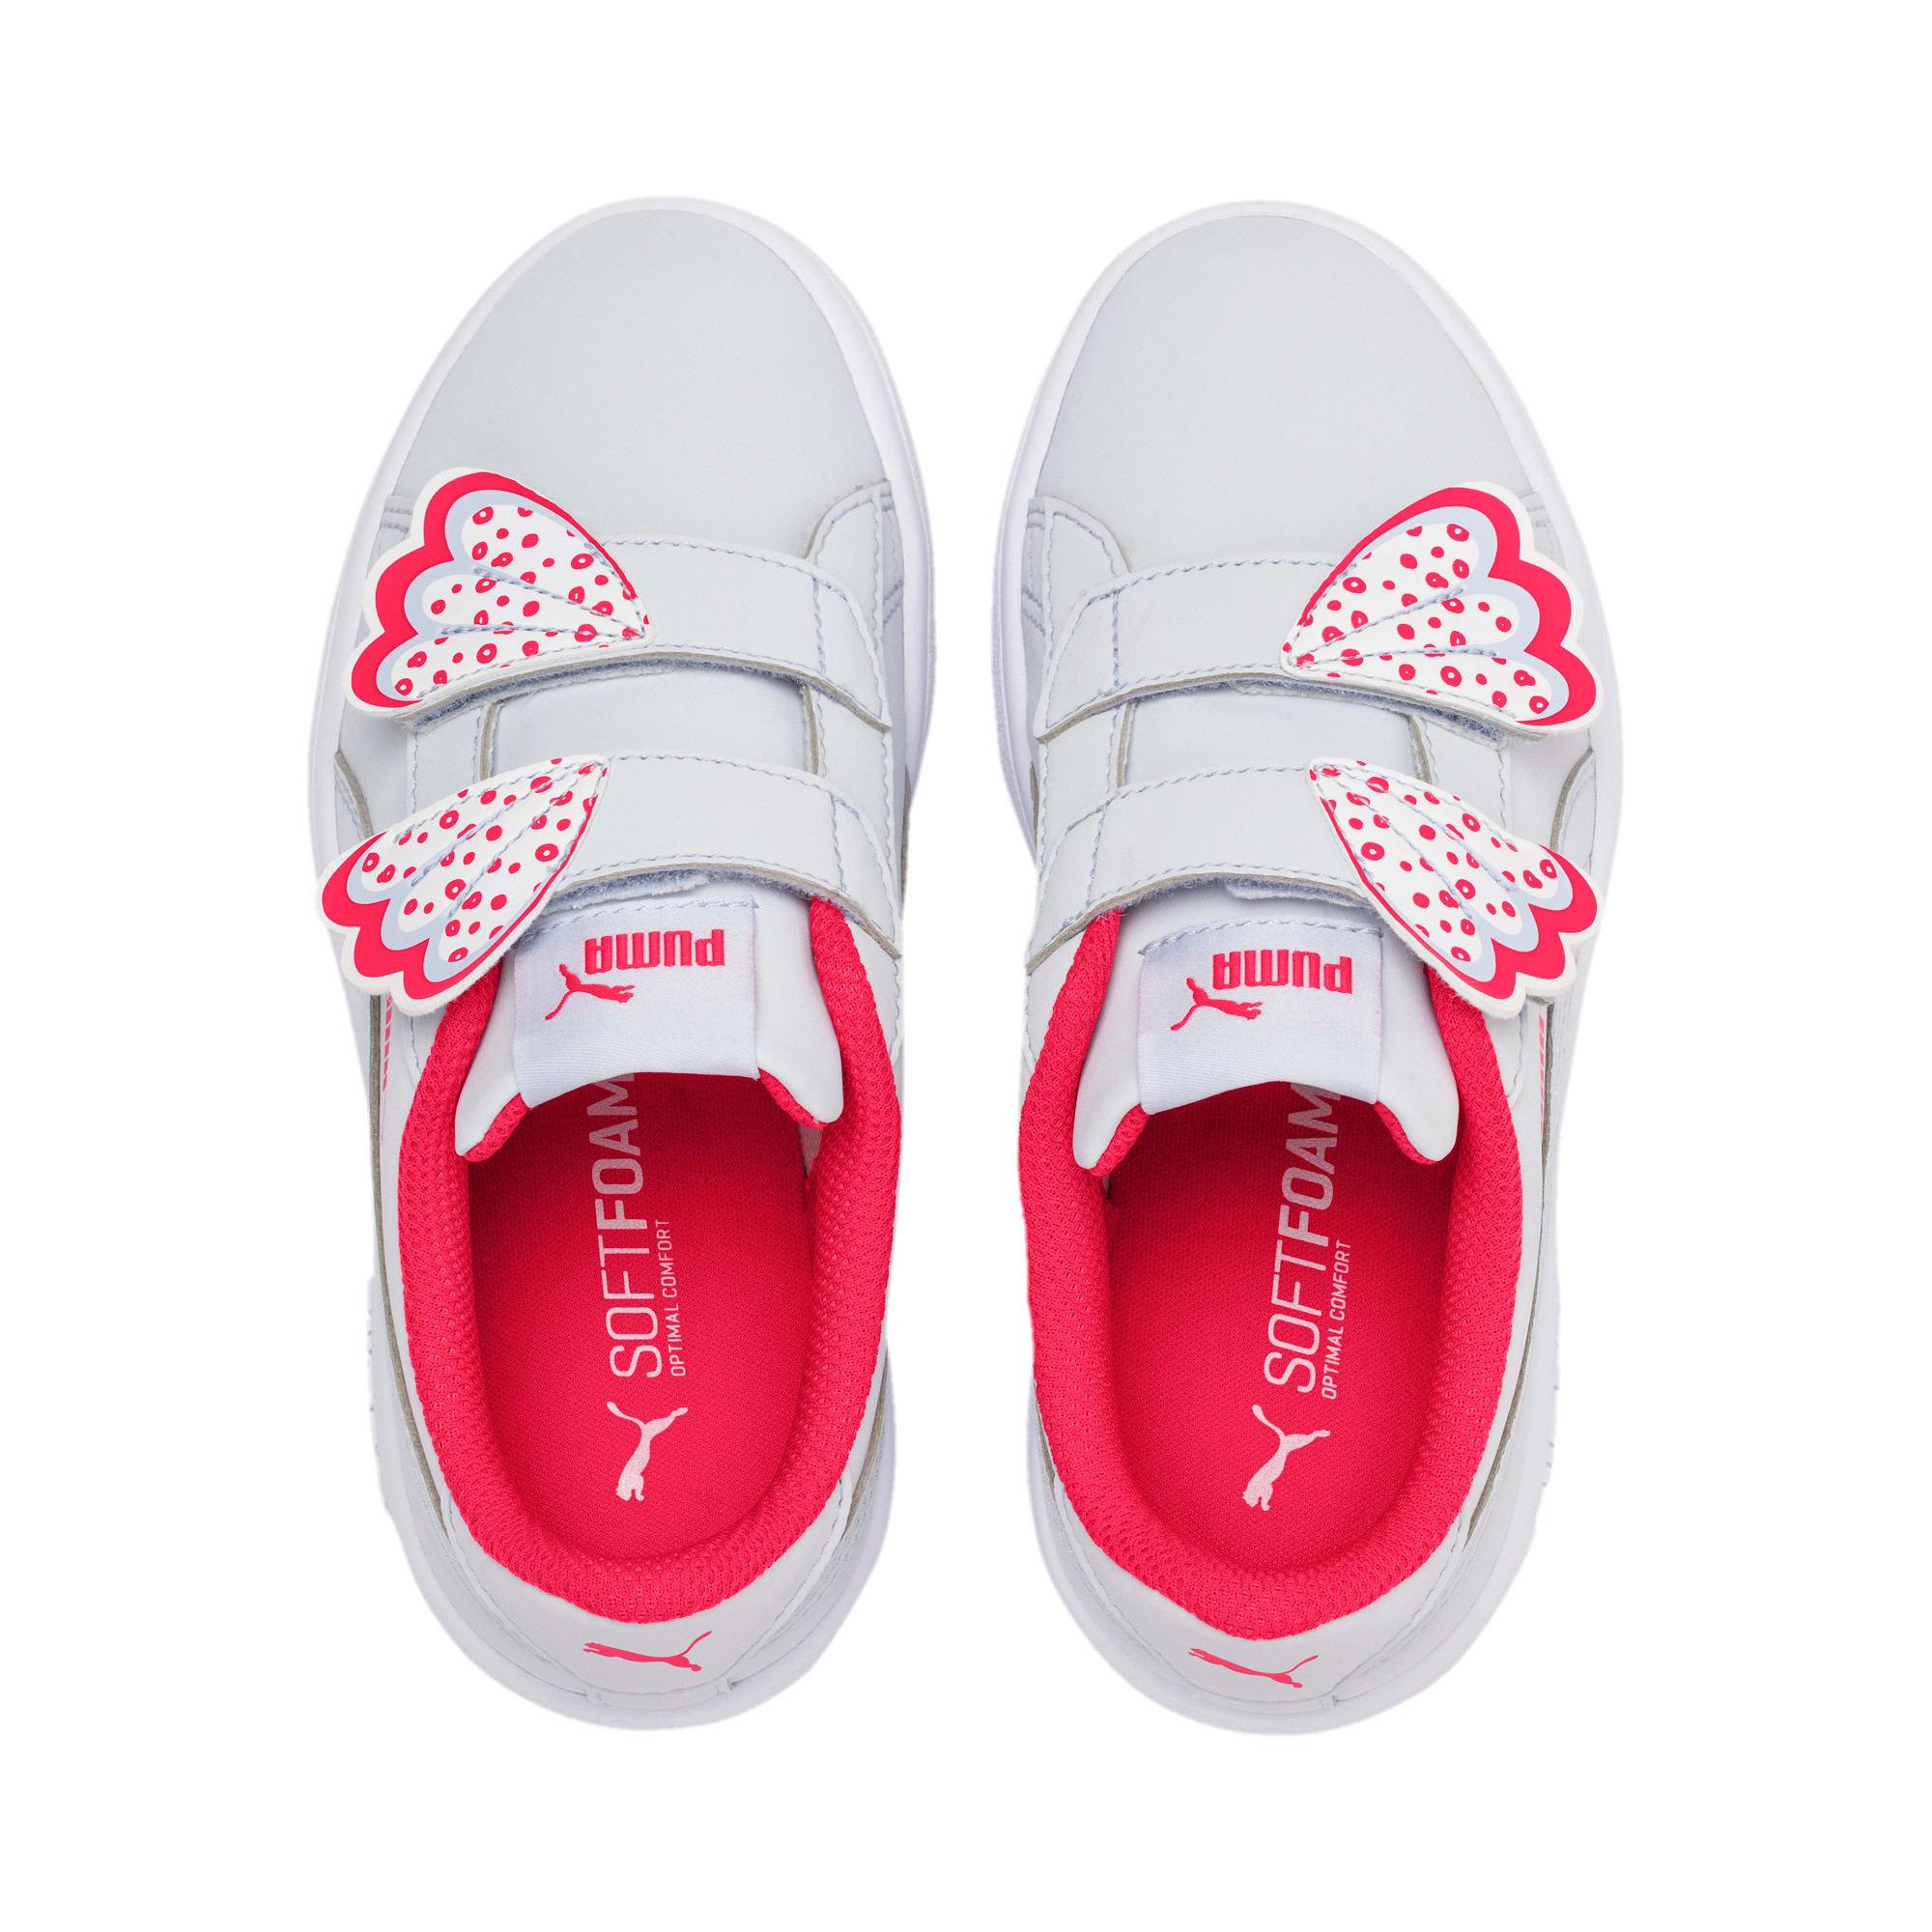 Thumbnail 6 of Puma Smash v2 Butterfly Little Kids' Shoes, Heather-Nrgy Rose-Puma White, medium